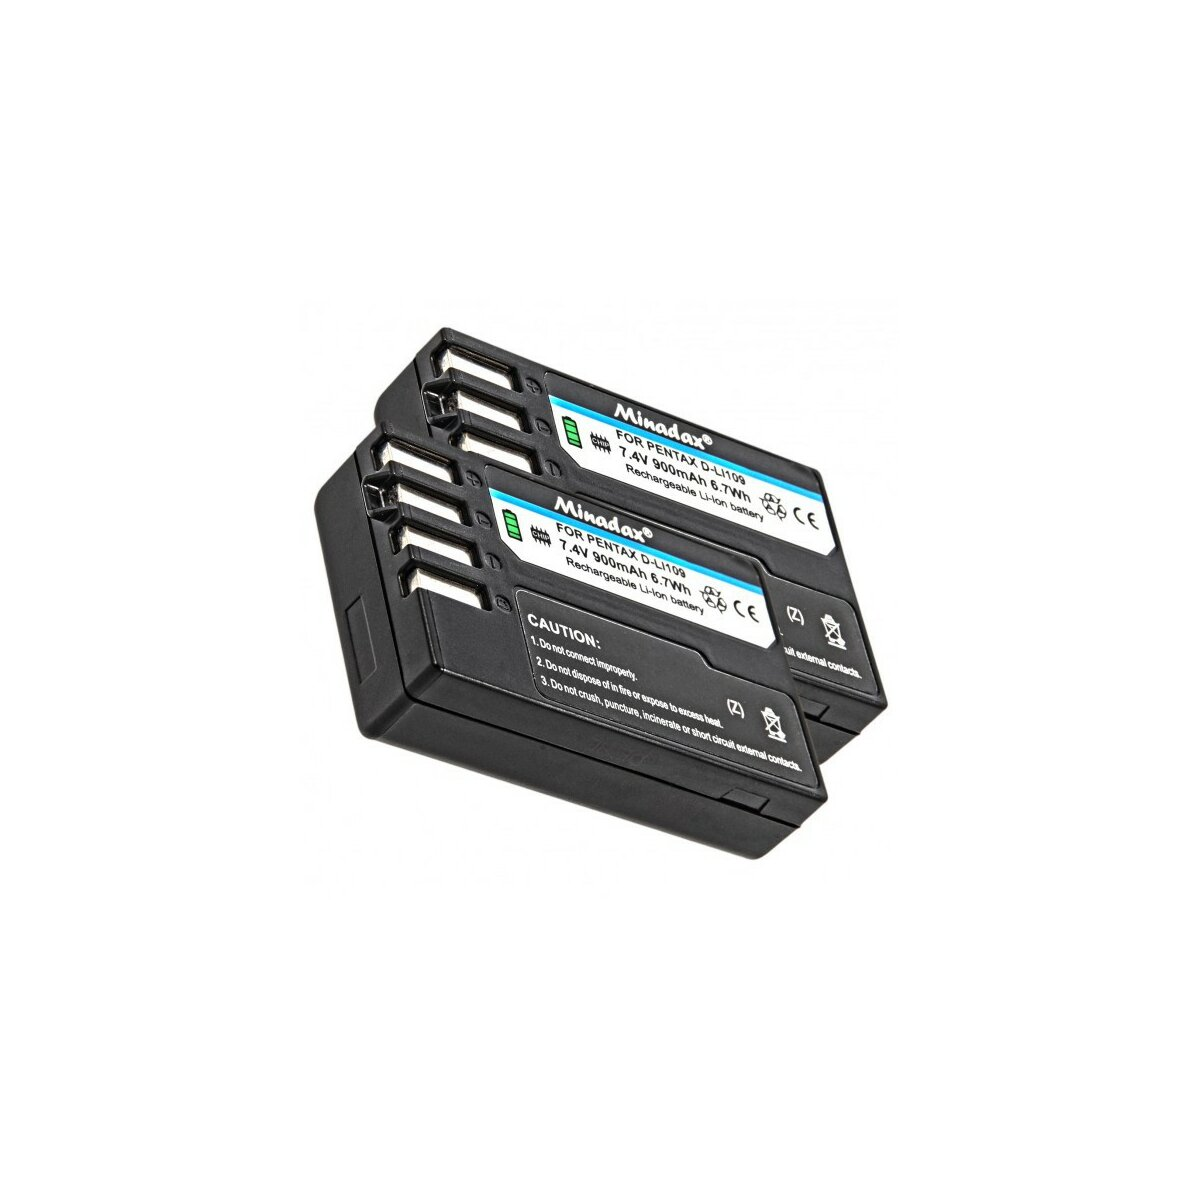 2x Minadax® Qualitaetsakku mit echten 900 mAh fuer Pentax K-r, K-30, wie D-LI109 - Intelligentes Akkusystem mit Chip